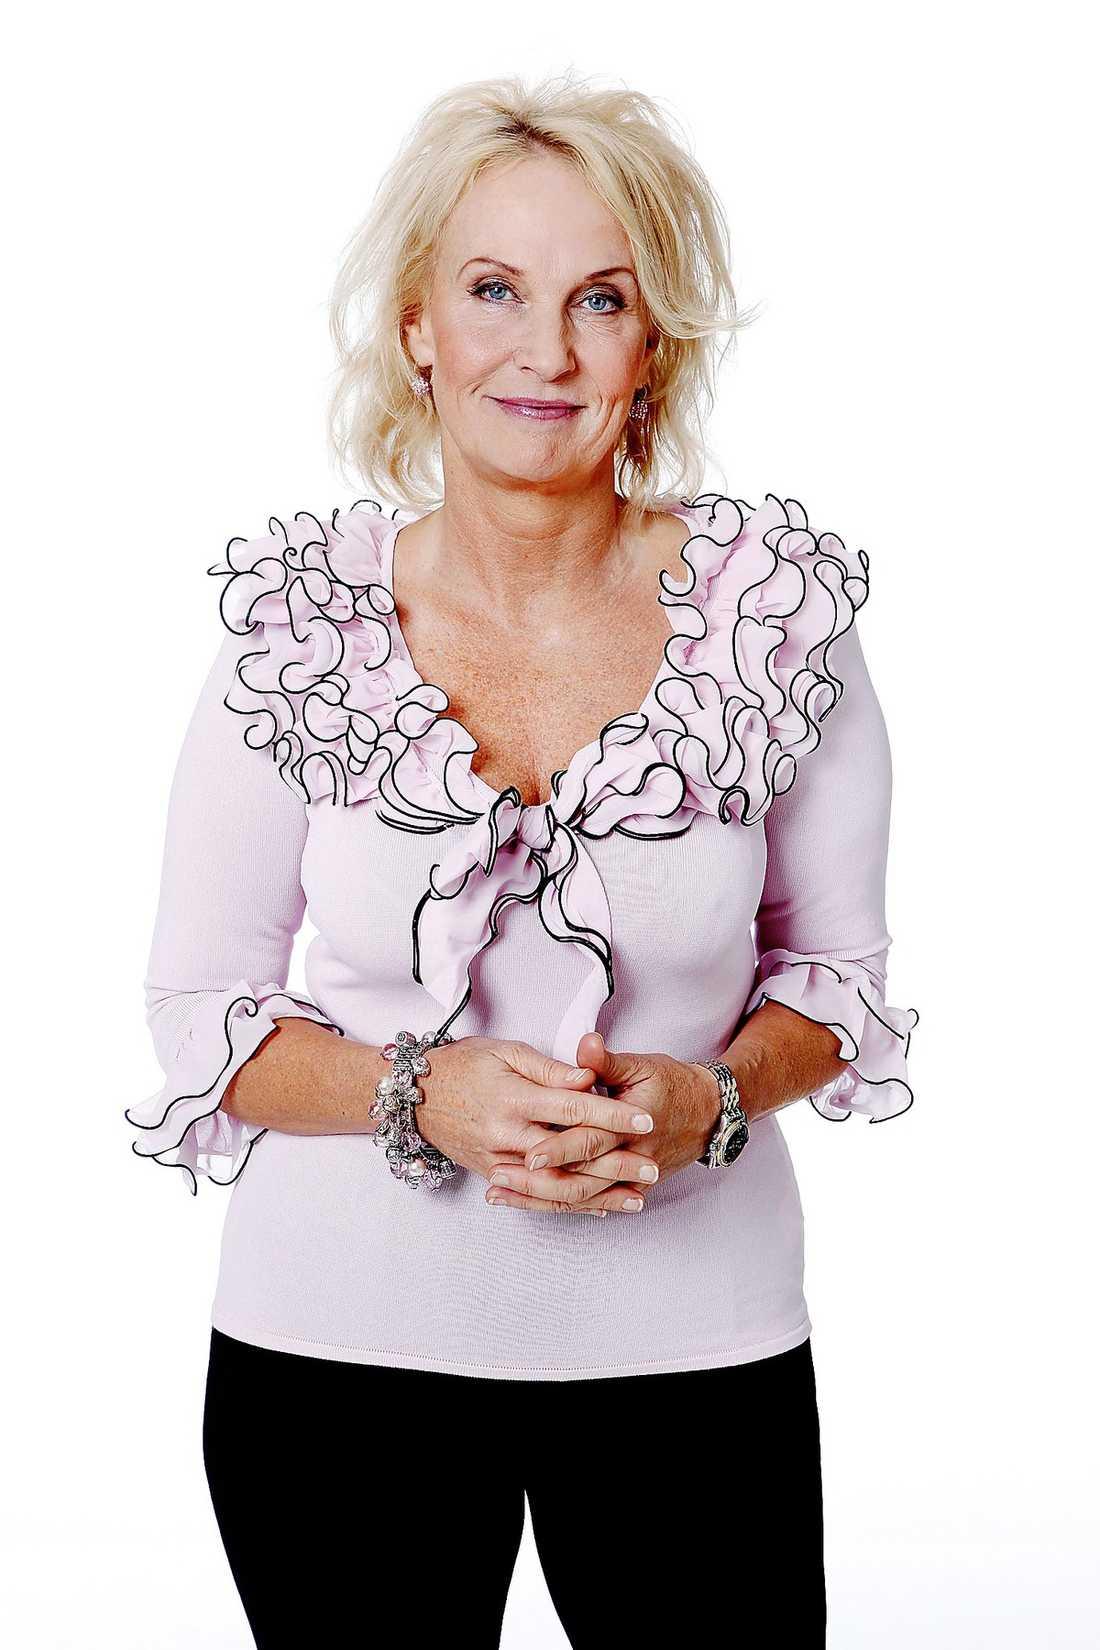 Aftonbladets relationsexpert Eva Rusz har själv haft många karriärer.